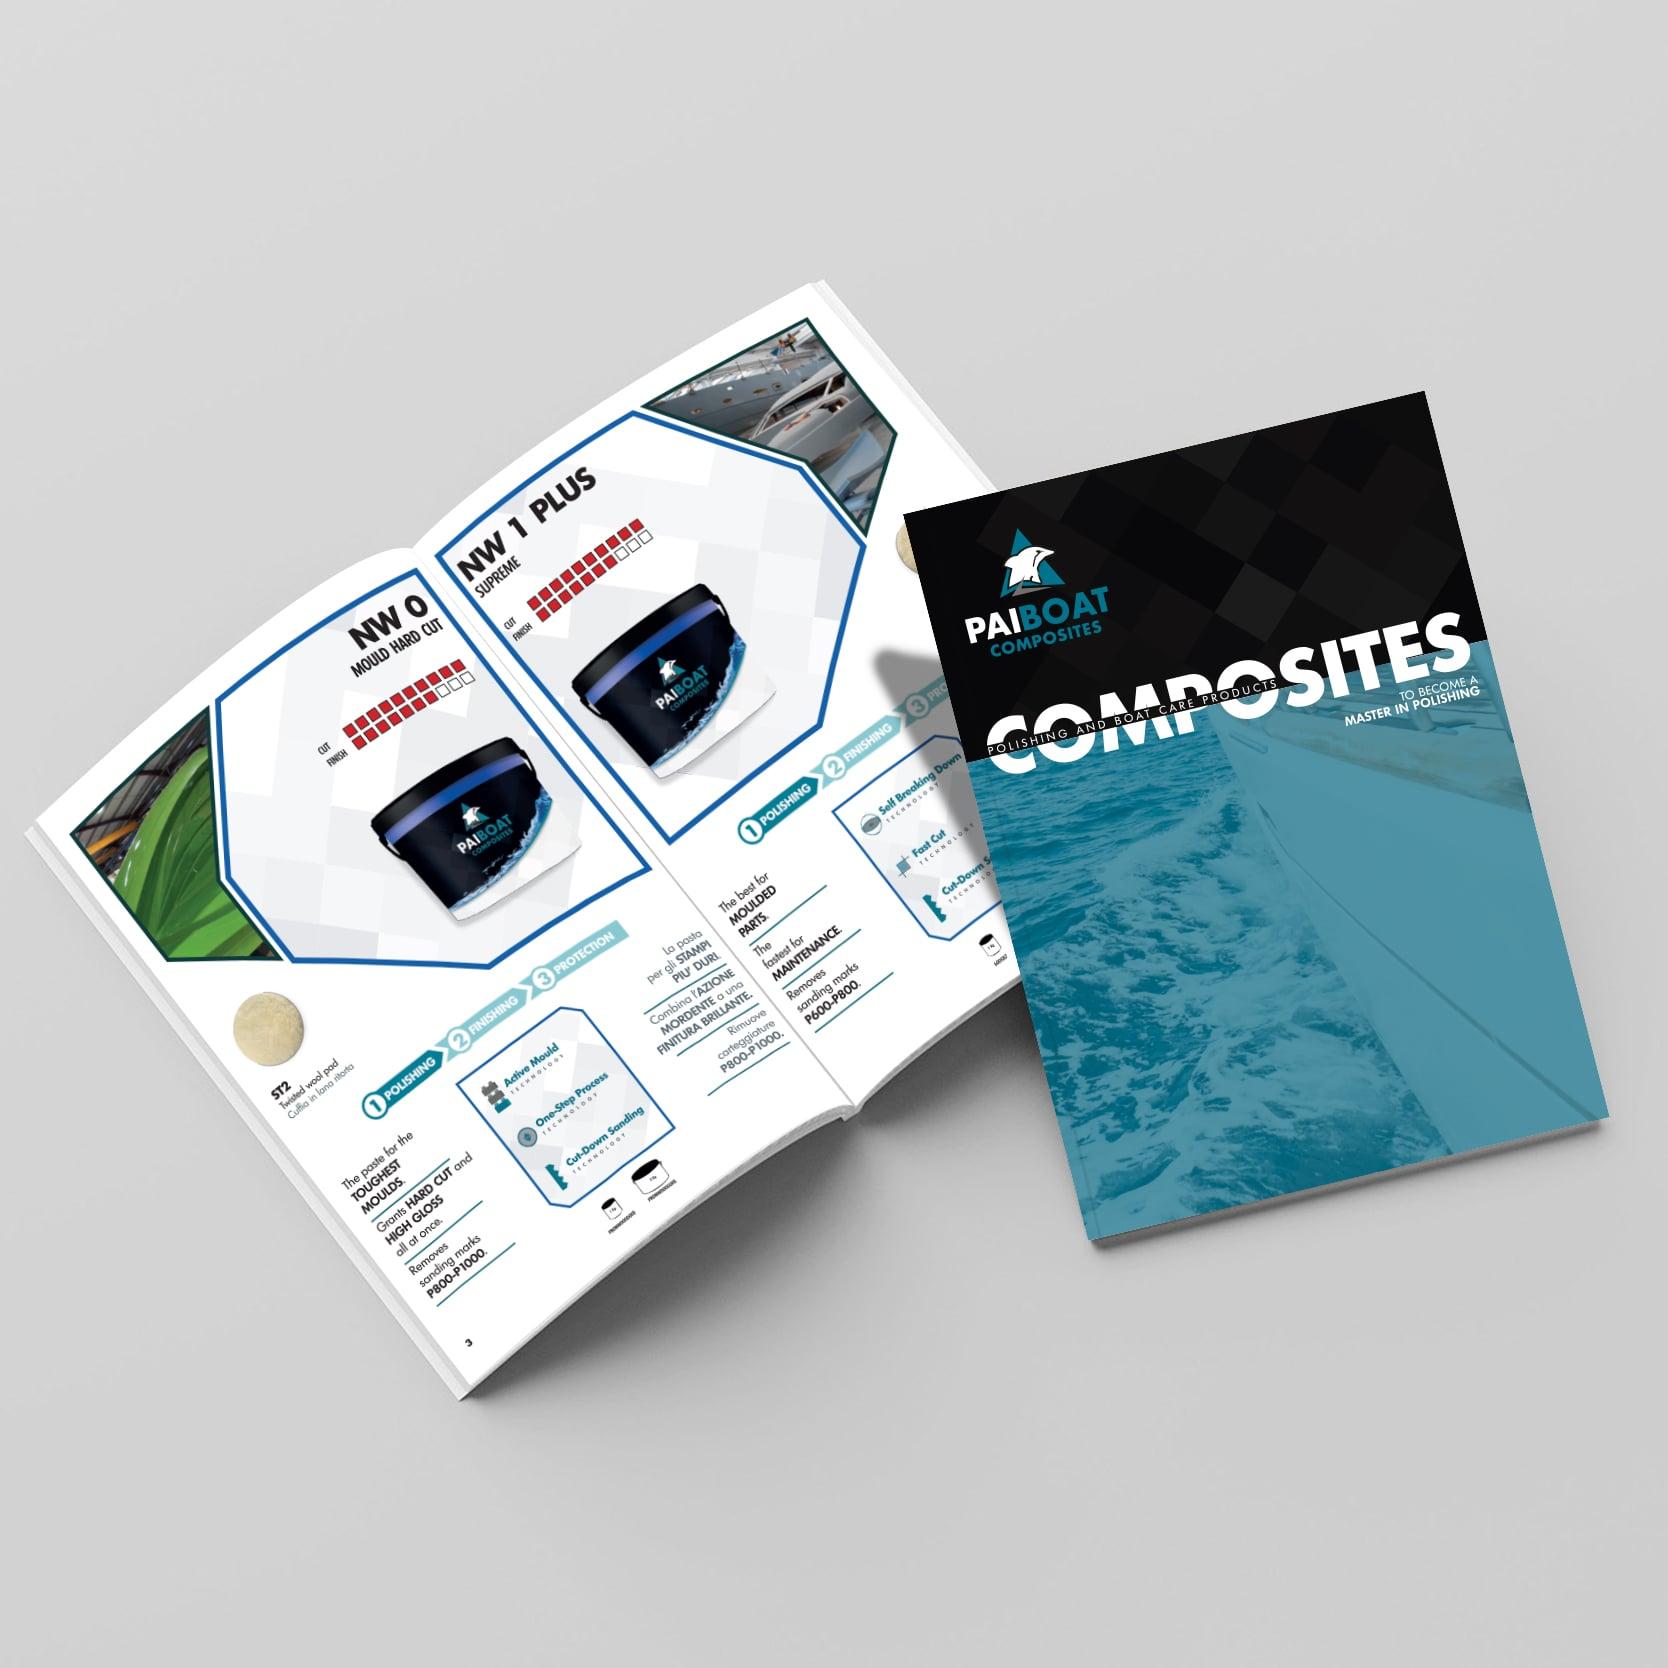 Pai Boat Composites catalogue polishing compound for composites